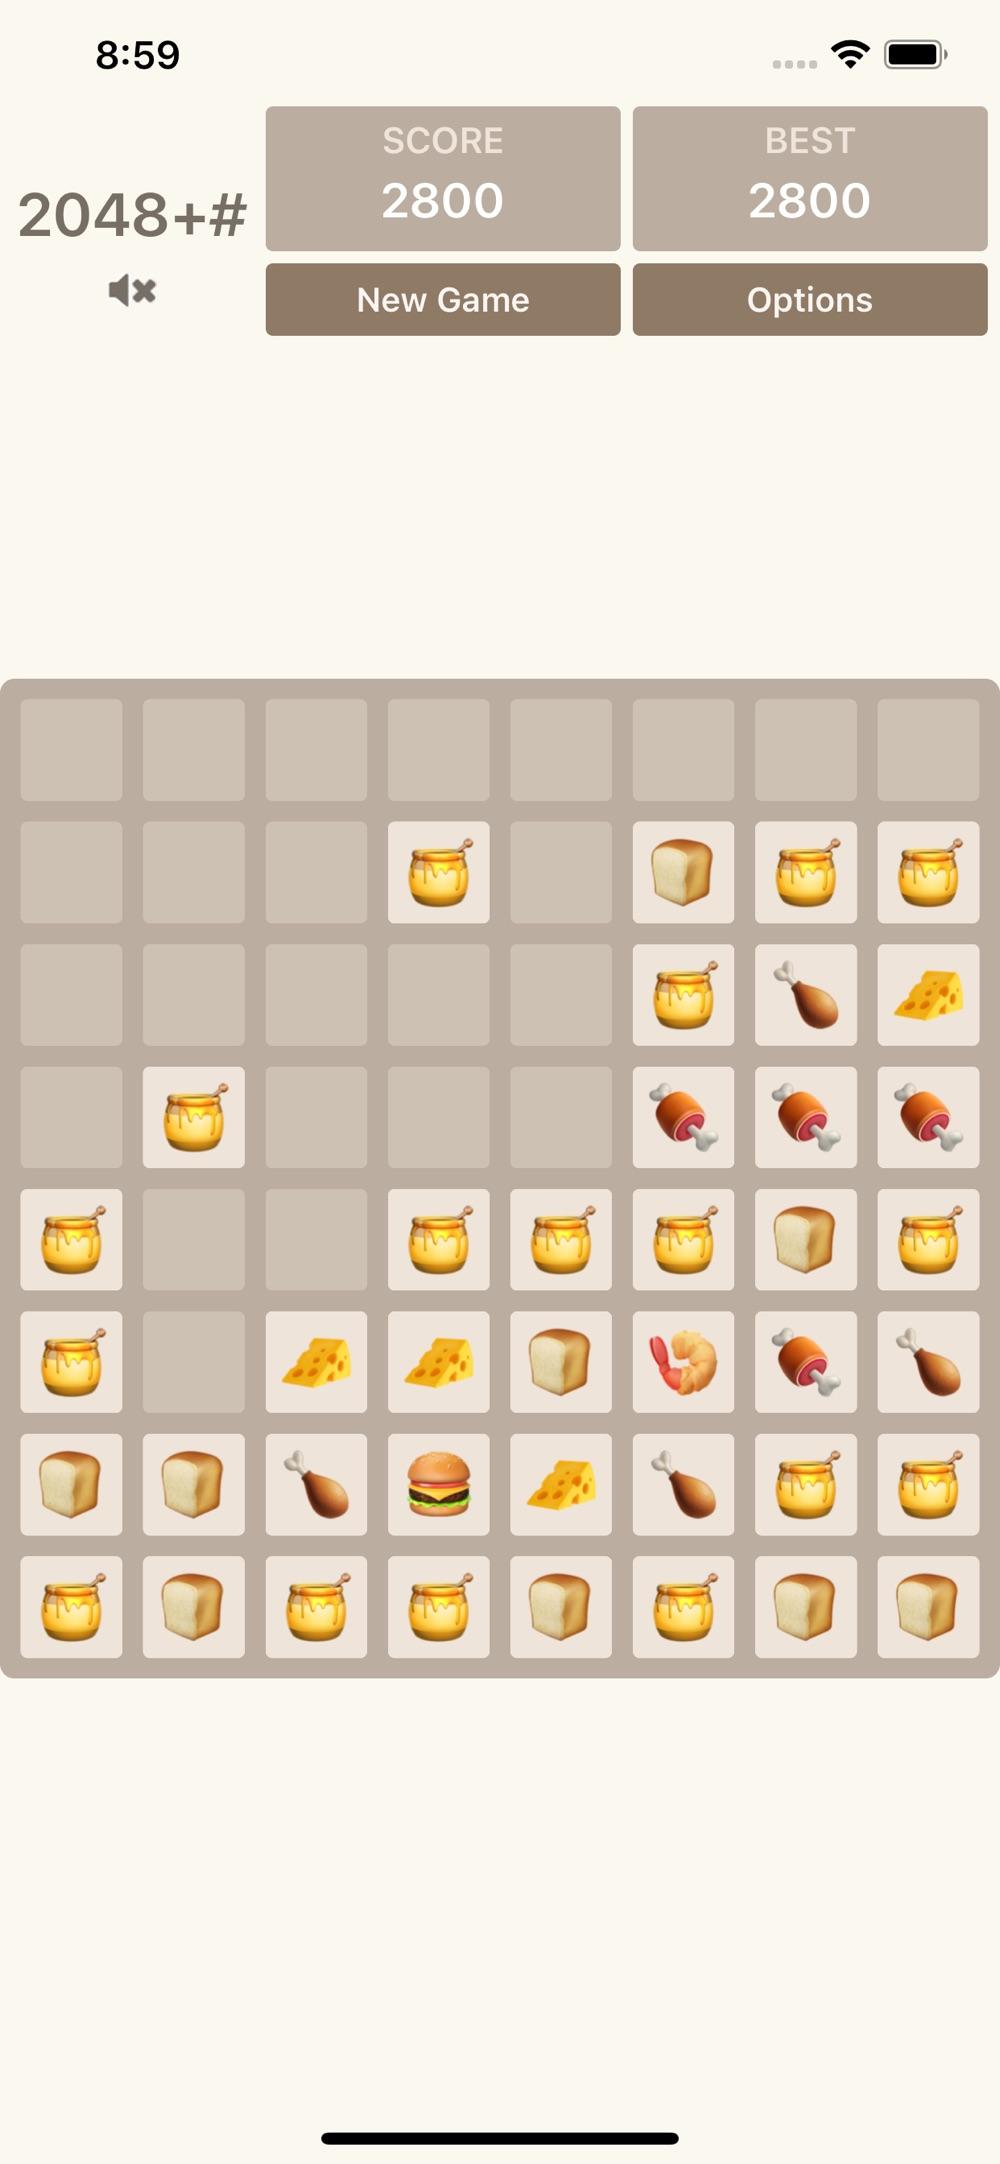 2048+# Cheat Codes